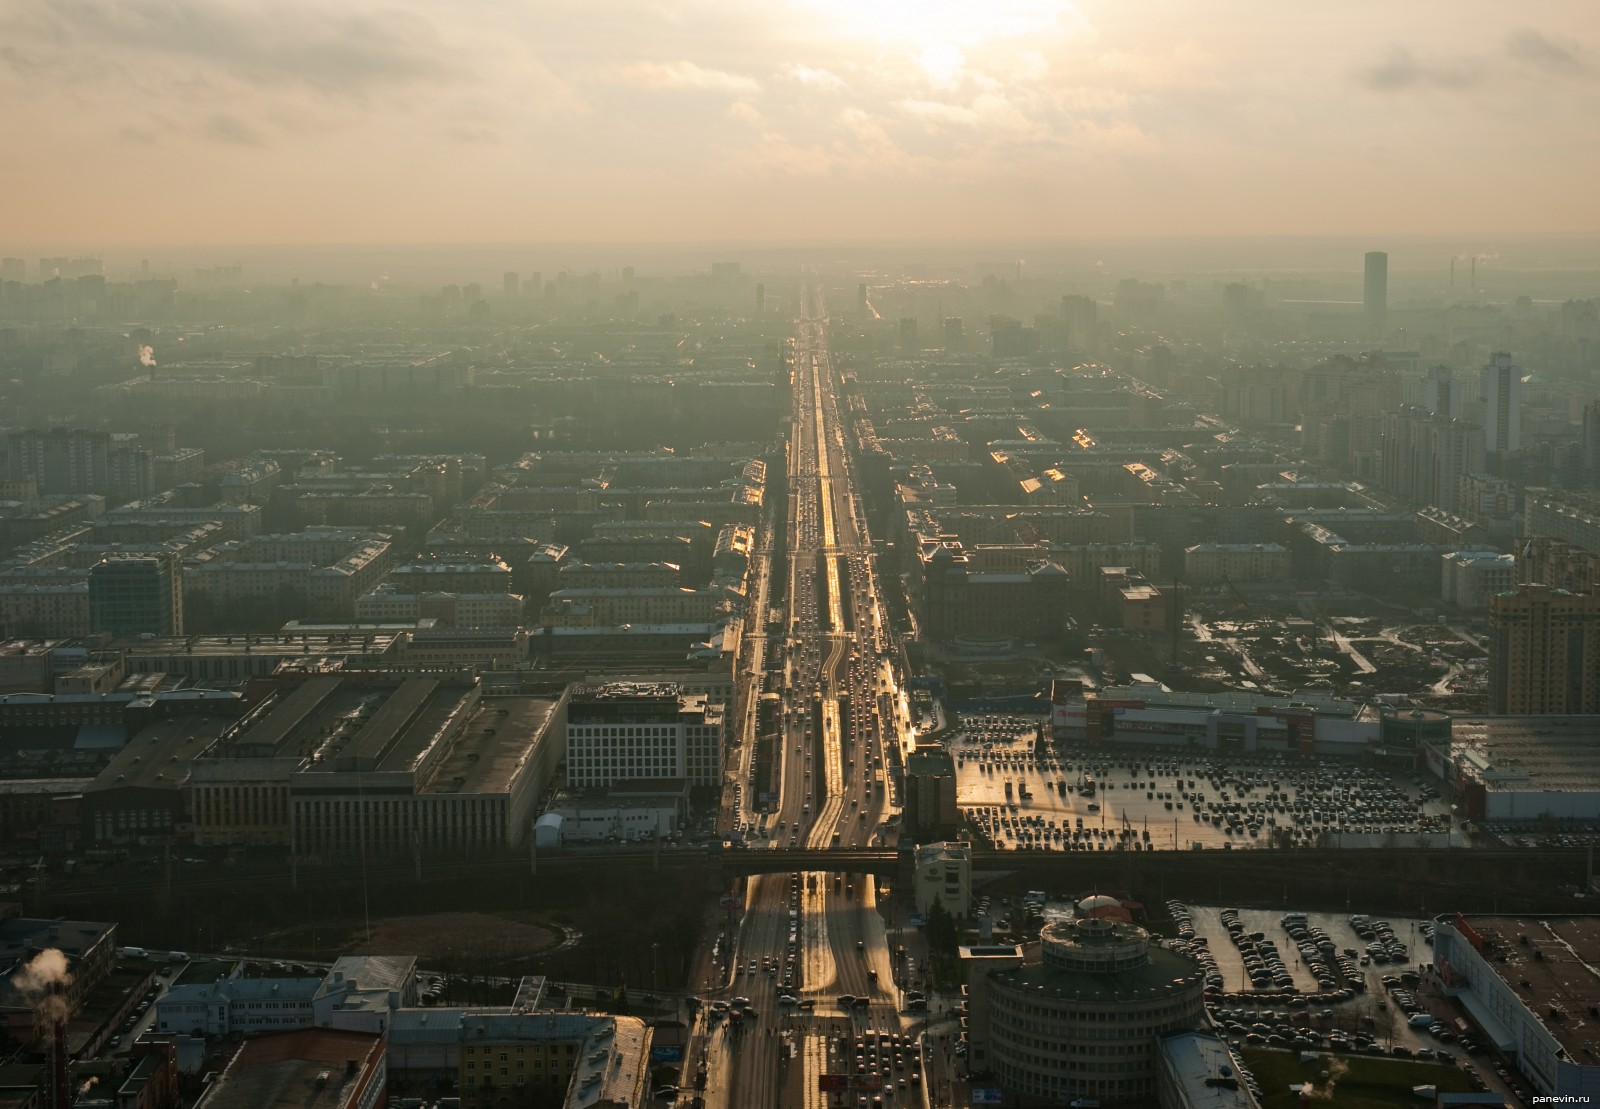 московский проспект фото